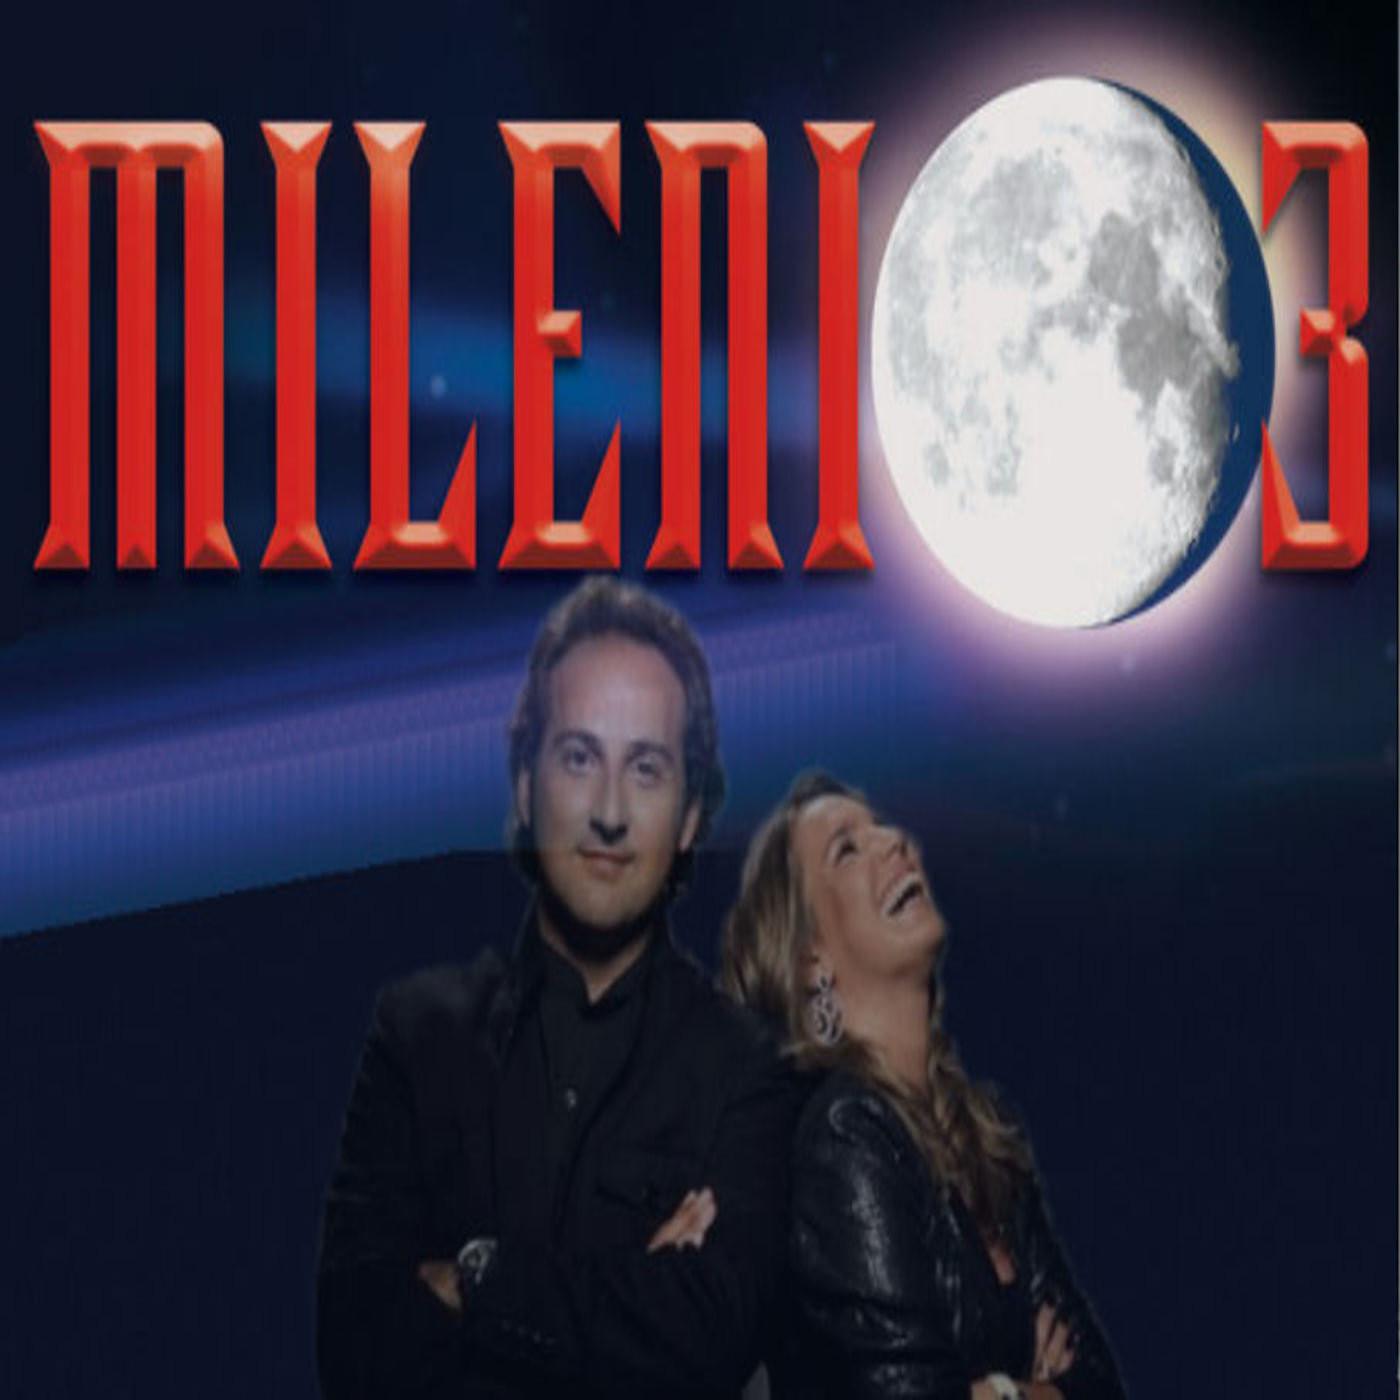 Escucha Milenio 3 (Programas 1-100) - iVoox